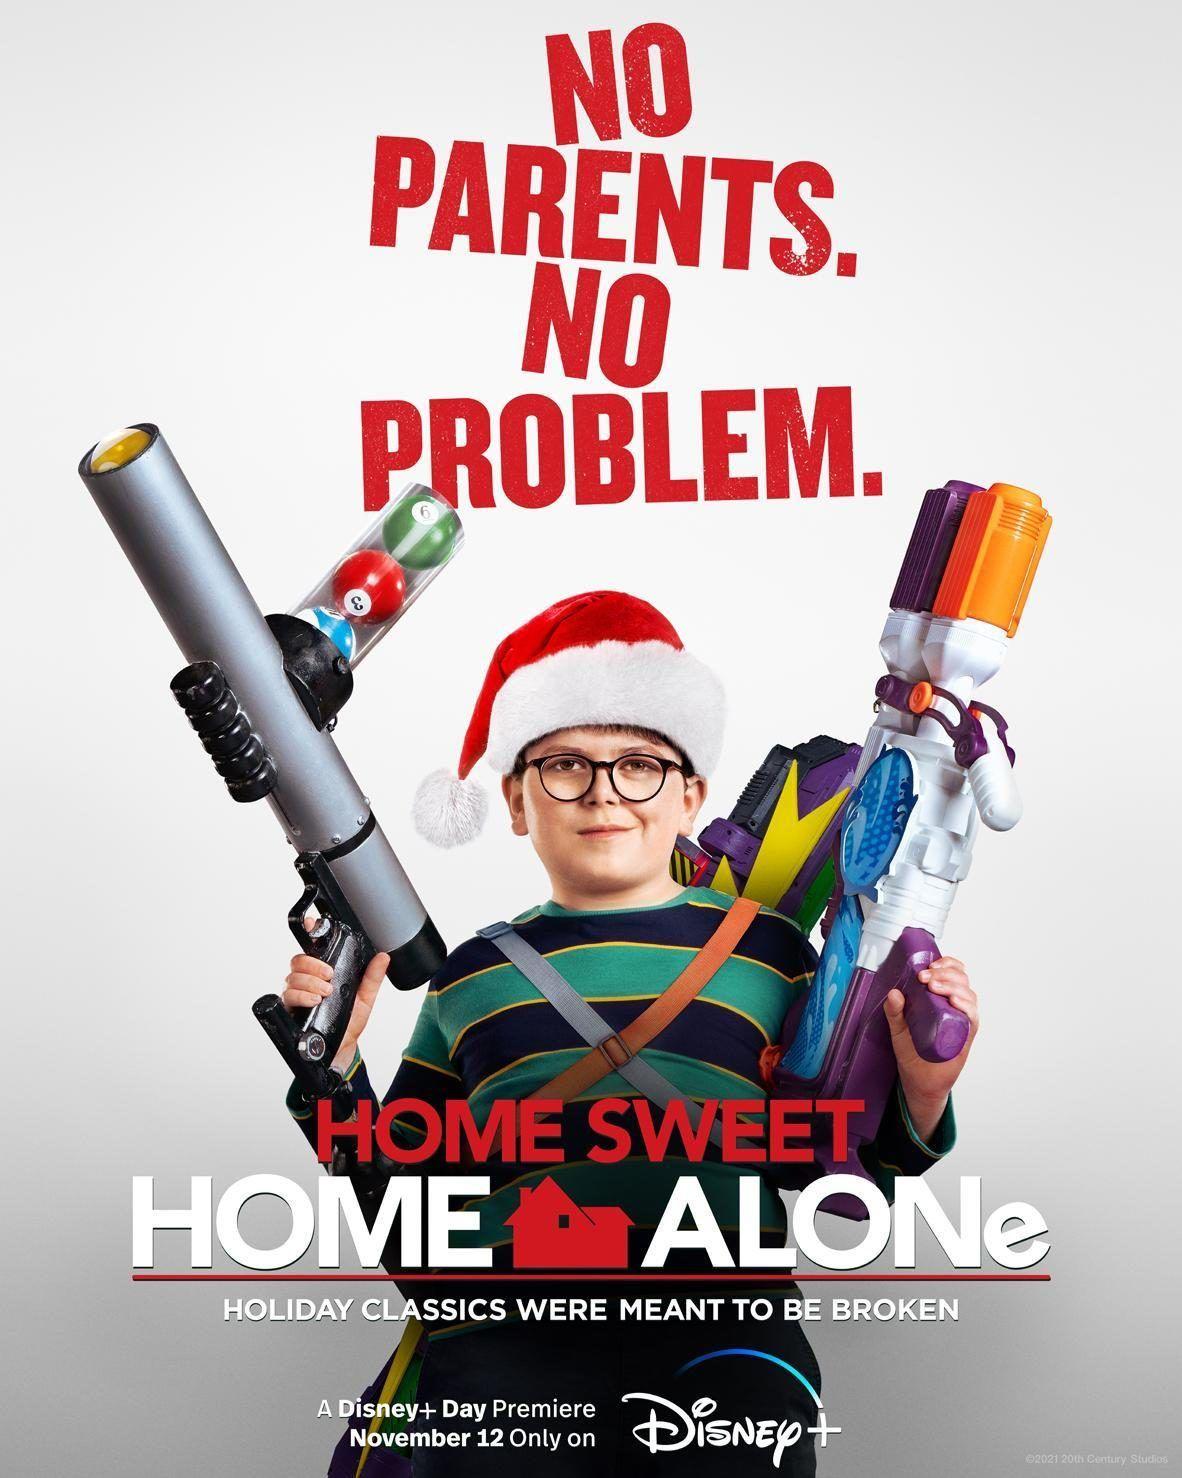 Disney представила трейлер ремейка «Один дома» (фото, видео) - 1 - изображение